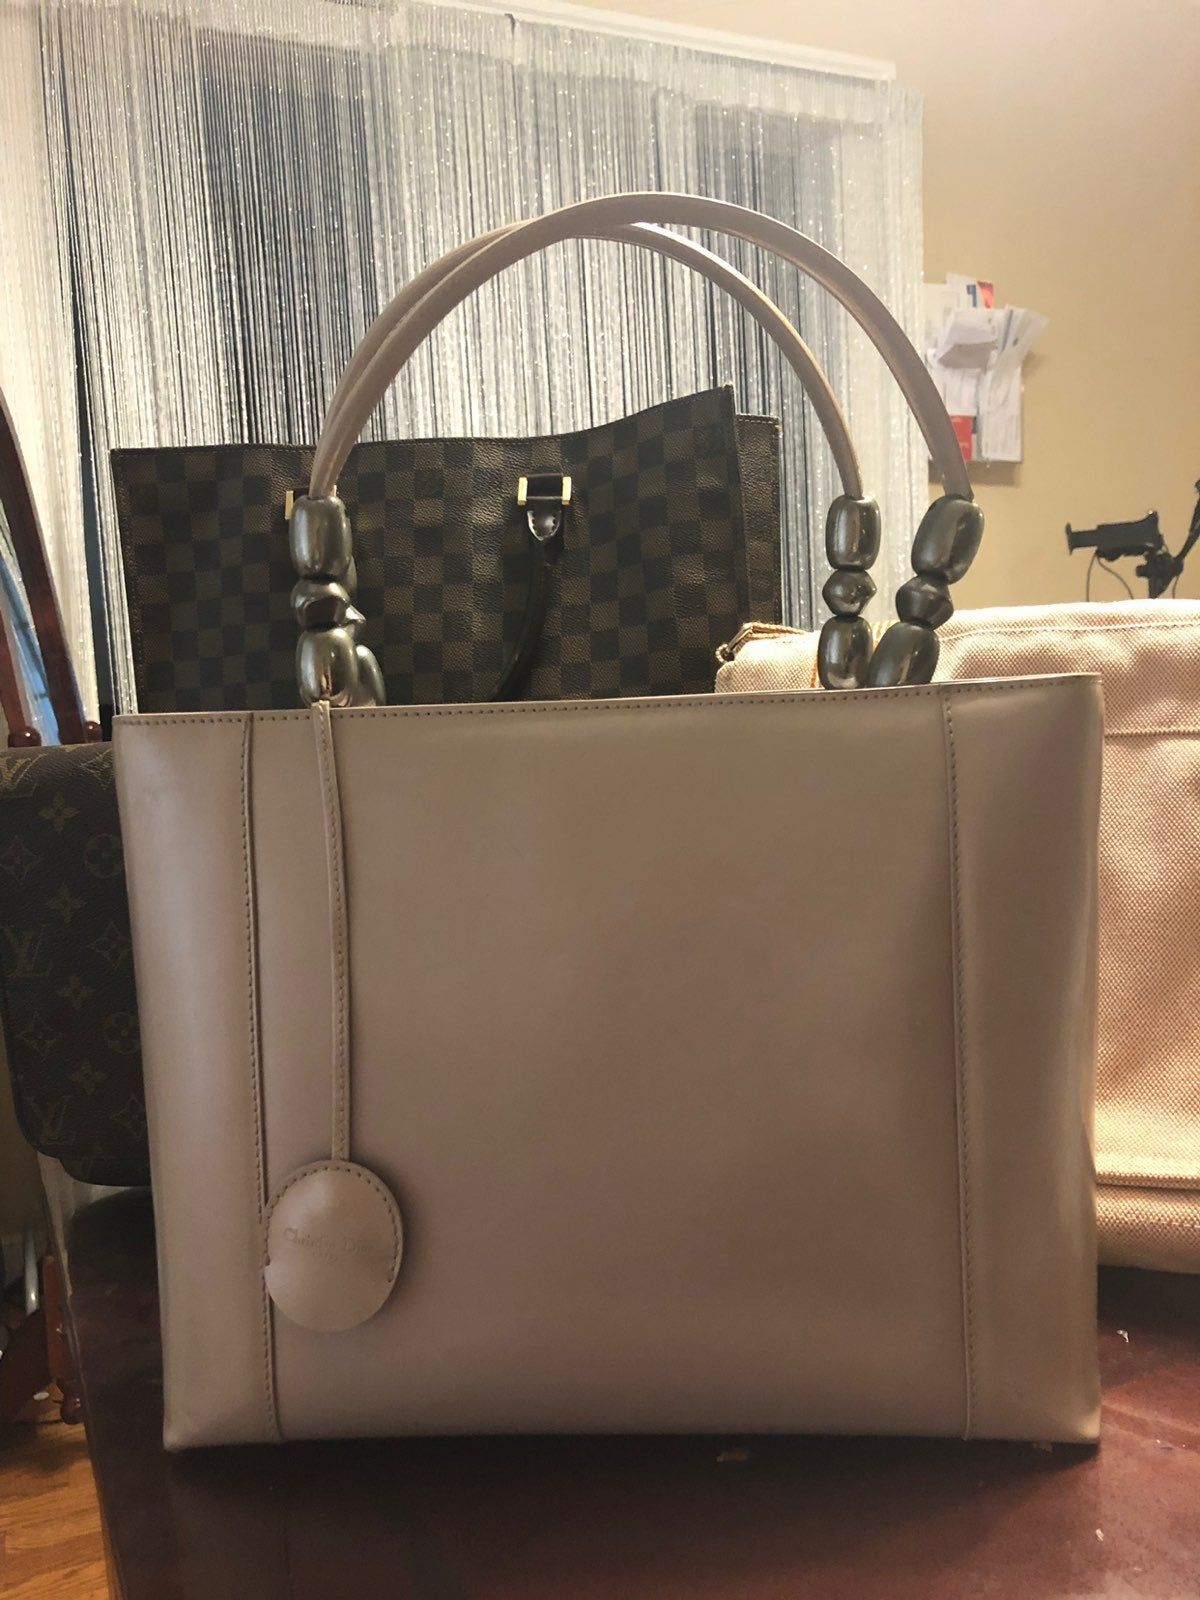 Authentic Preloved Beautiful Christian Dior Handbag Medium Size Handbag And You Can Add A Sling Christian Dior Handbags Tote Bag Louis Vuitton Bag Neverfull